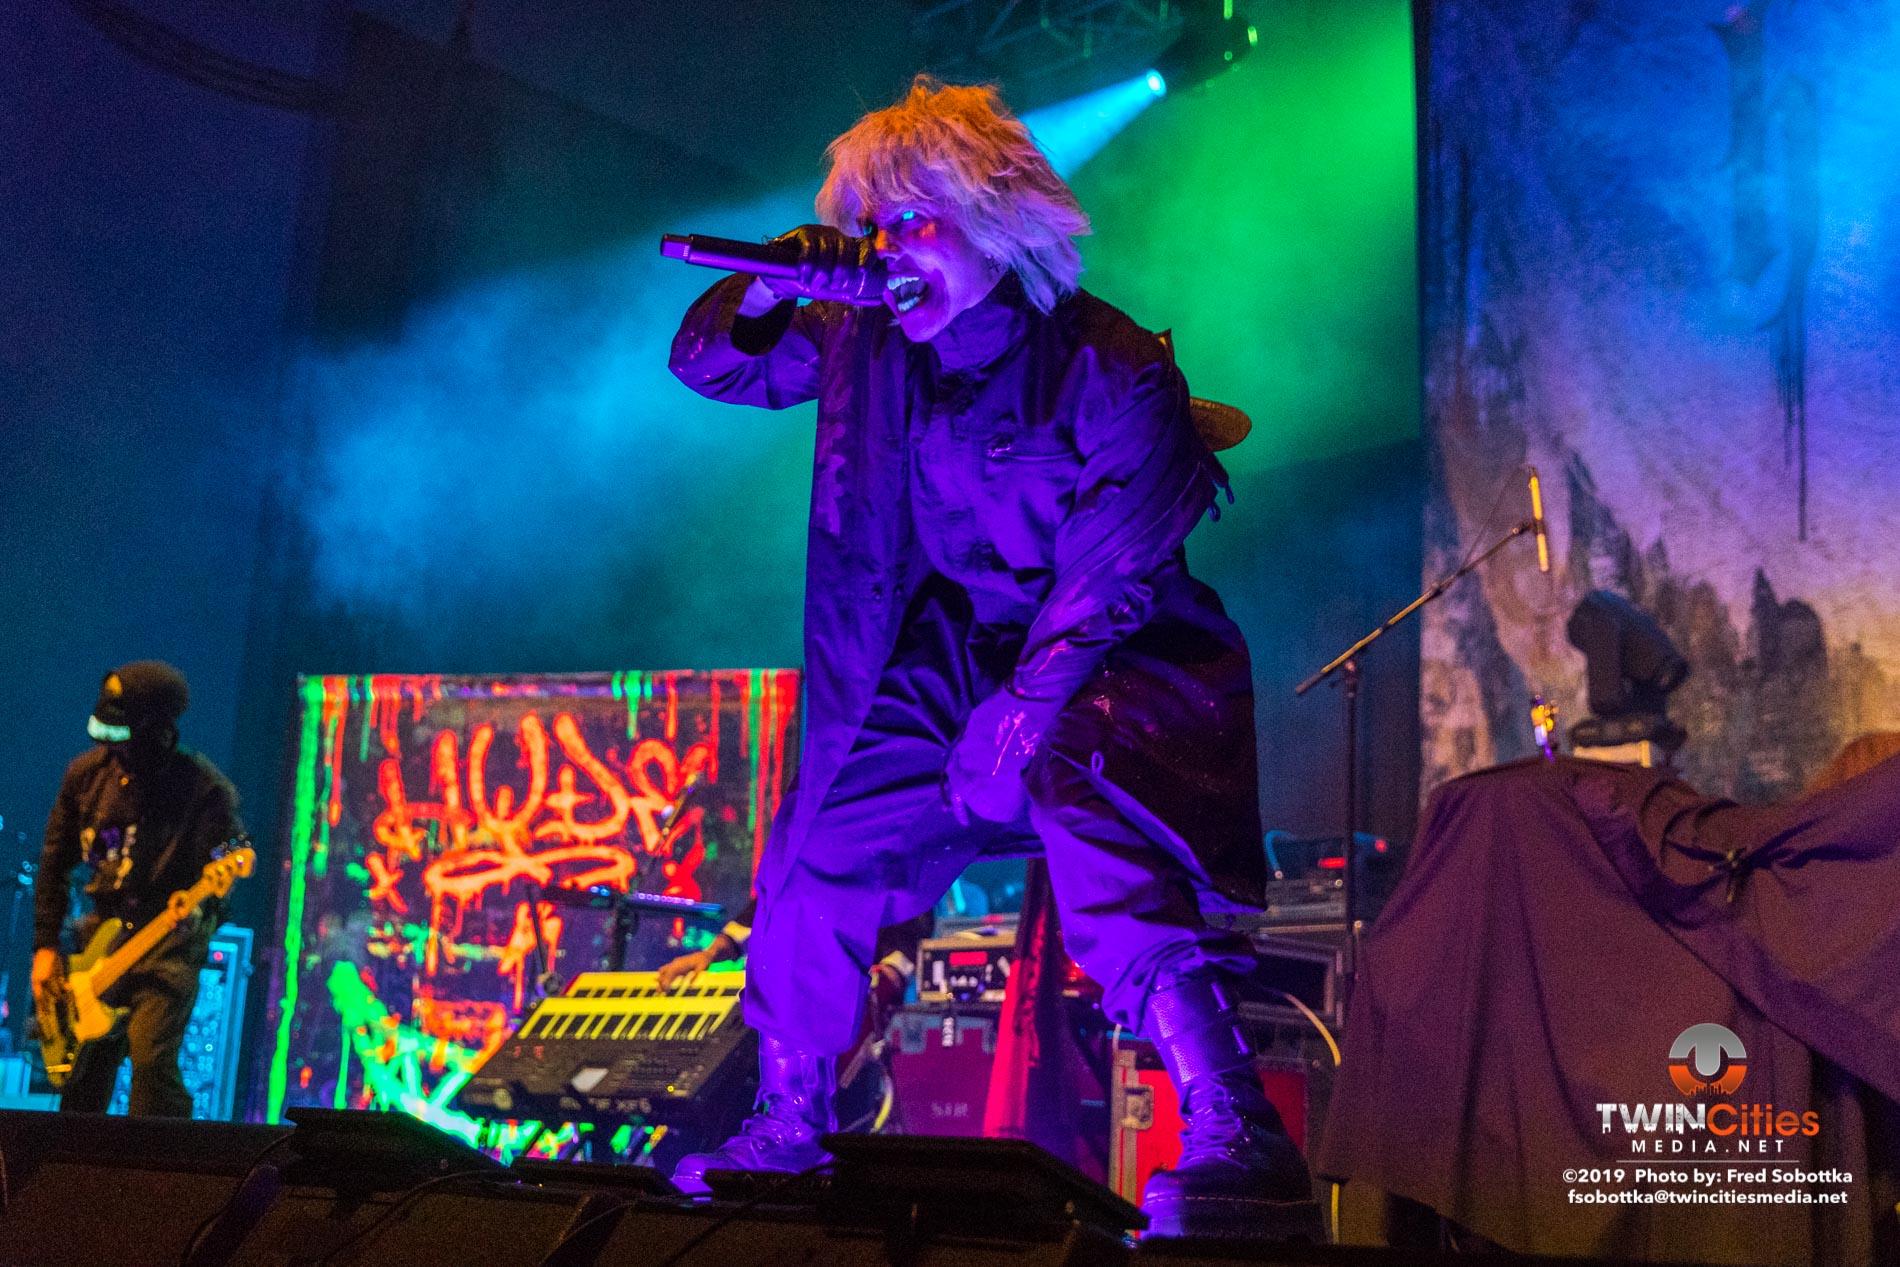 Hyde-10